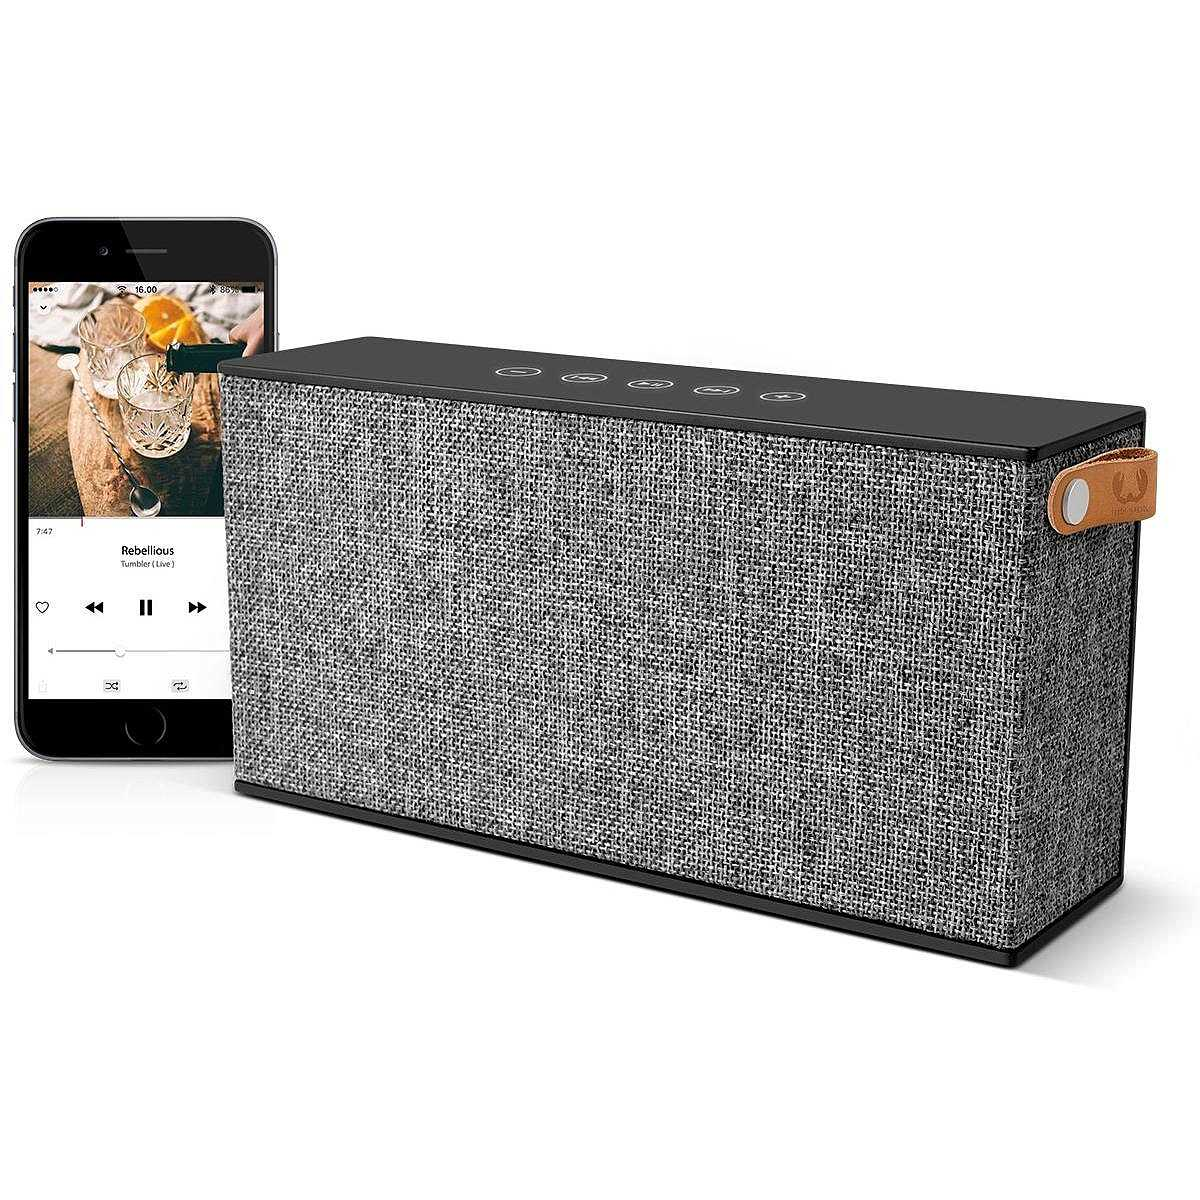 Nero Fresh N RebelRockbox Chunk Altoparlante Bluetooth